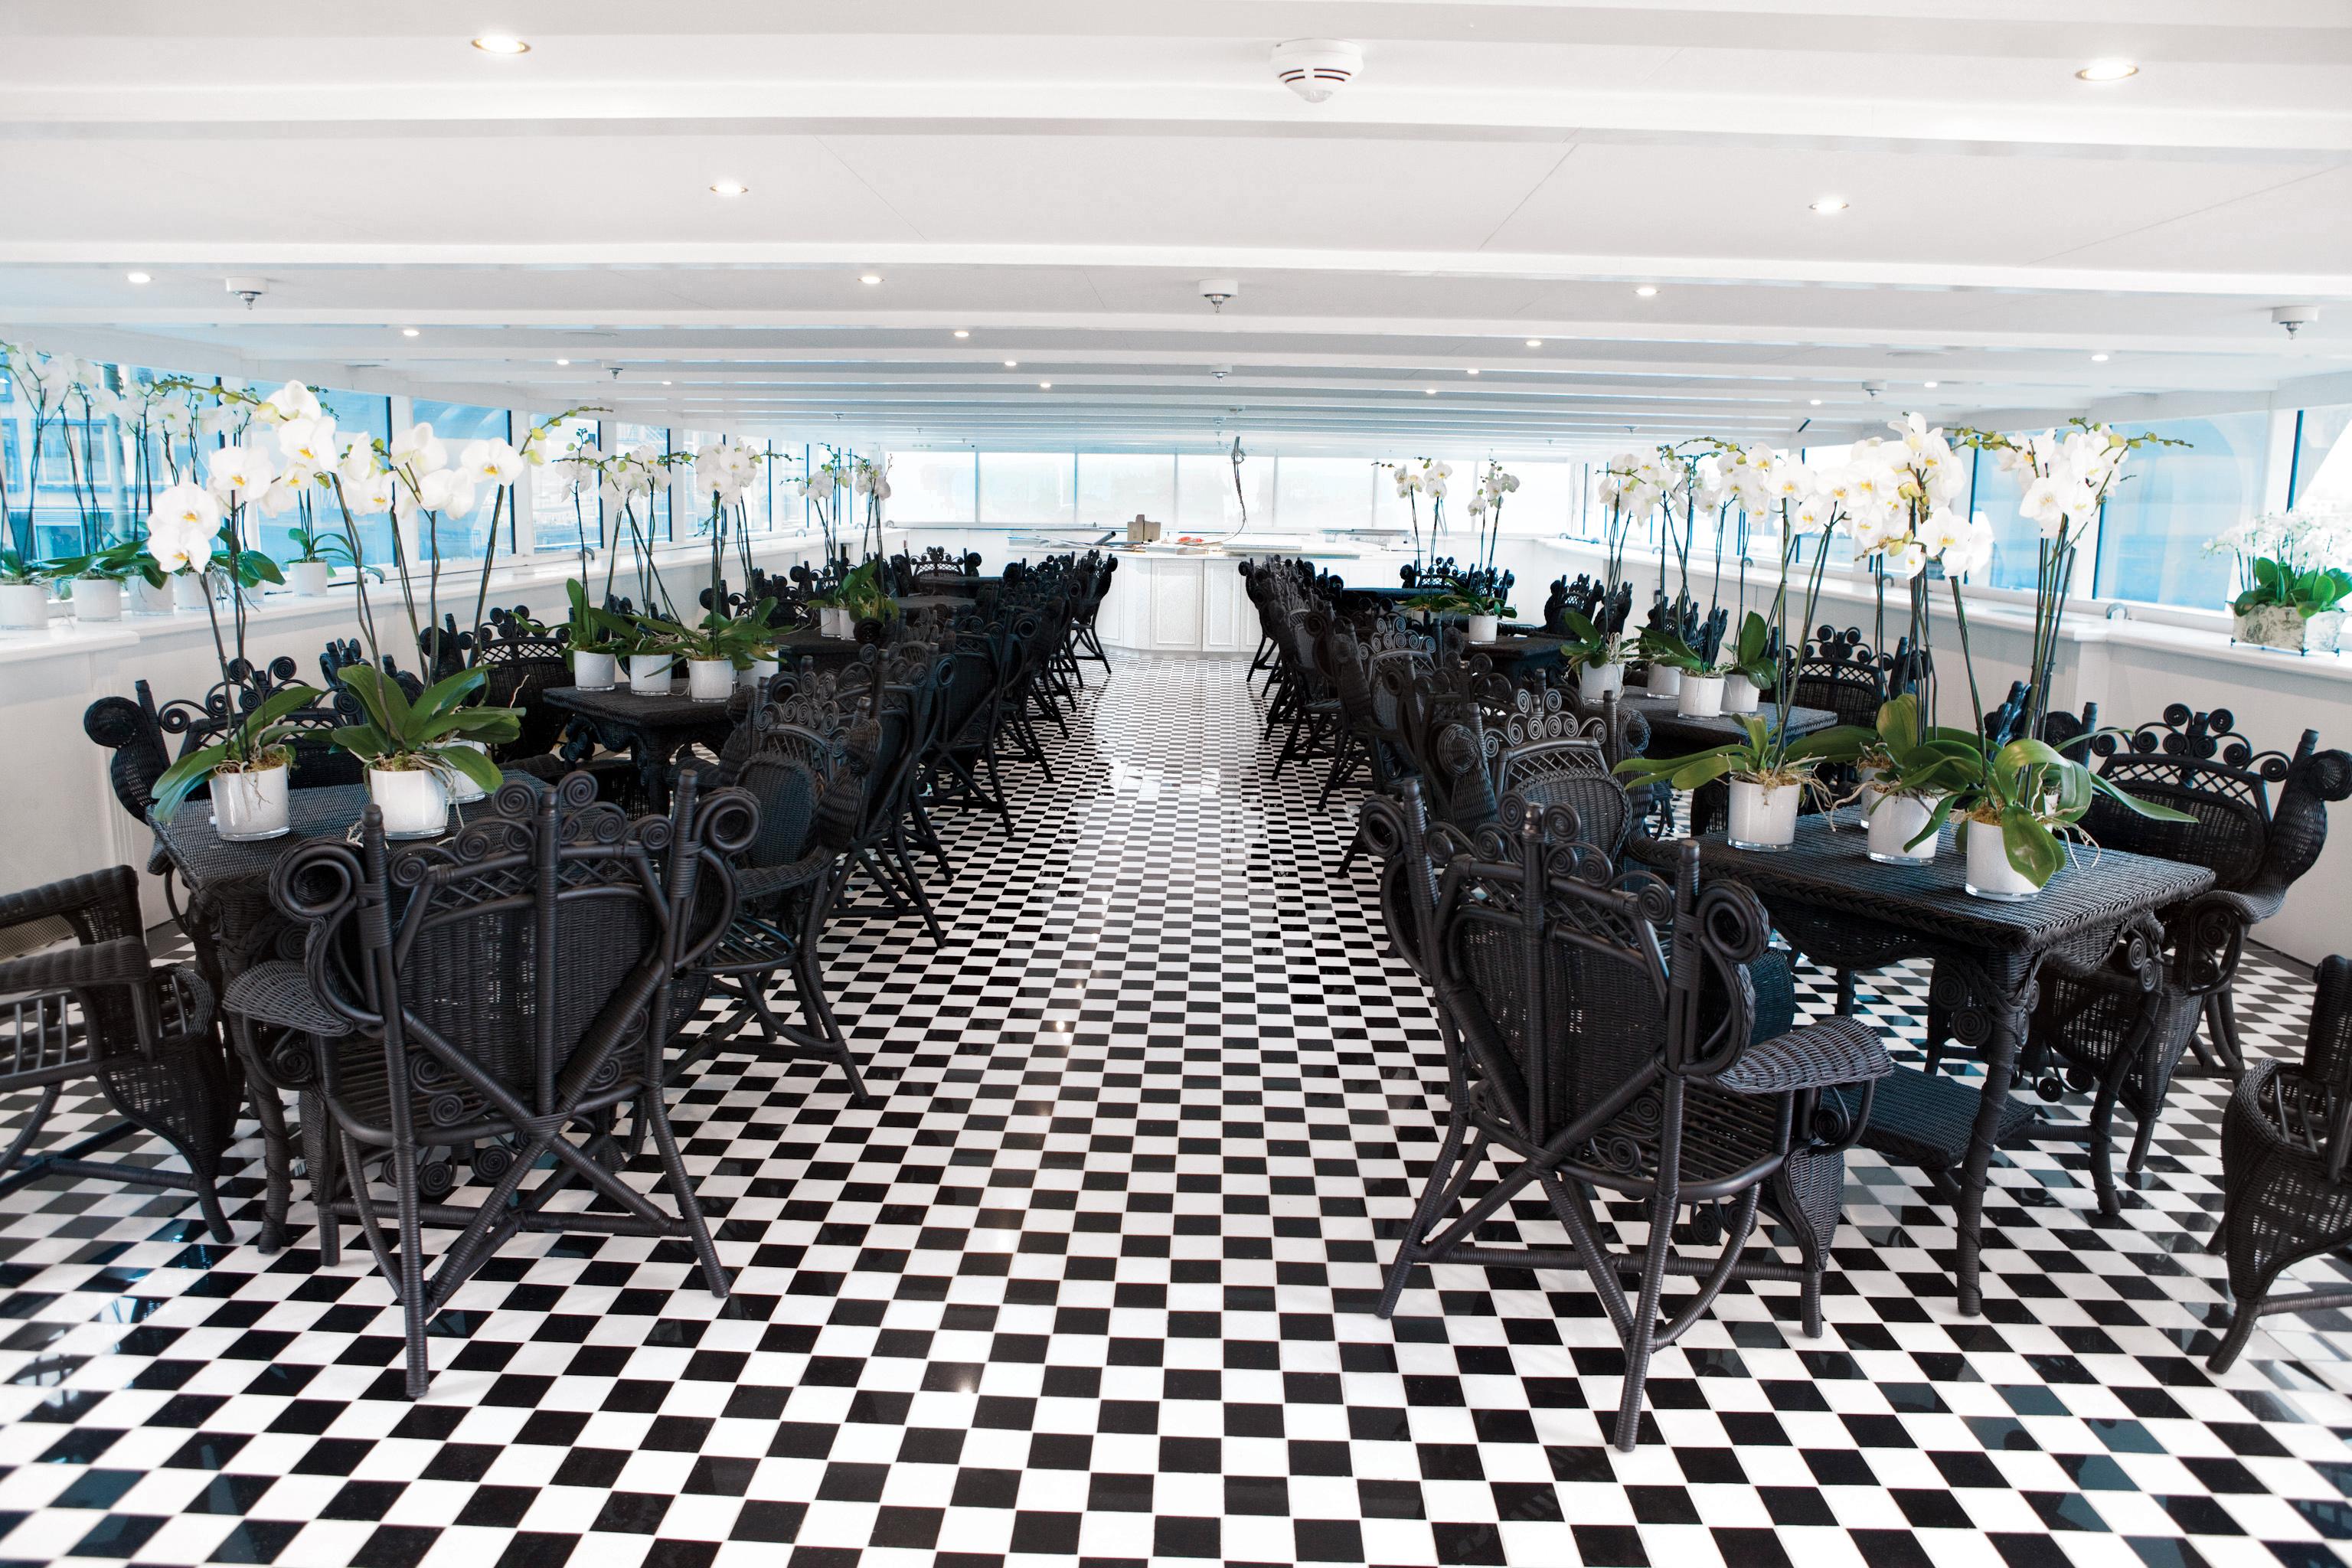 UNIWORLD Boutique River Cruises SS Antoinette Interior L'Orangerie.jpg